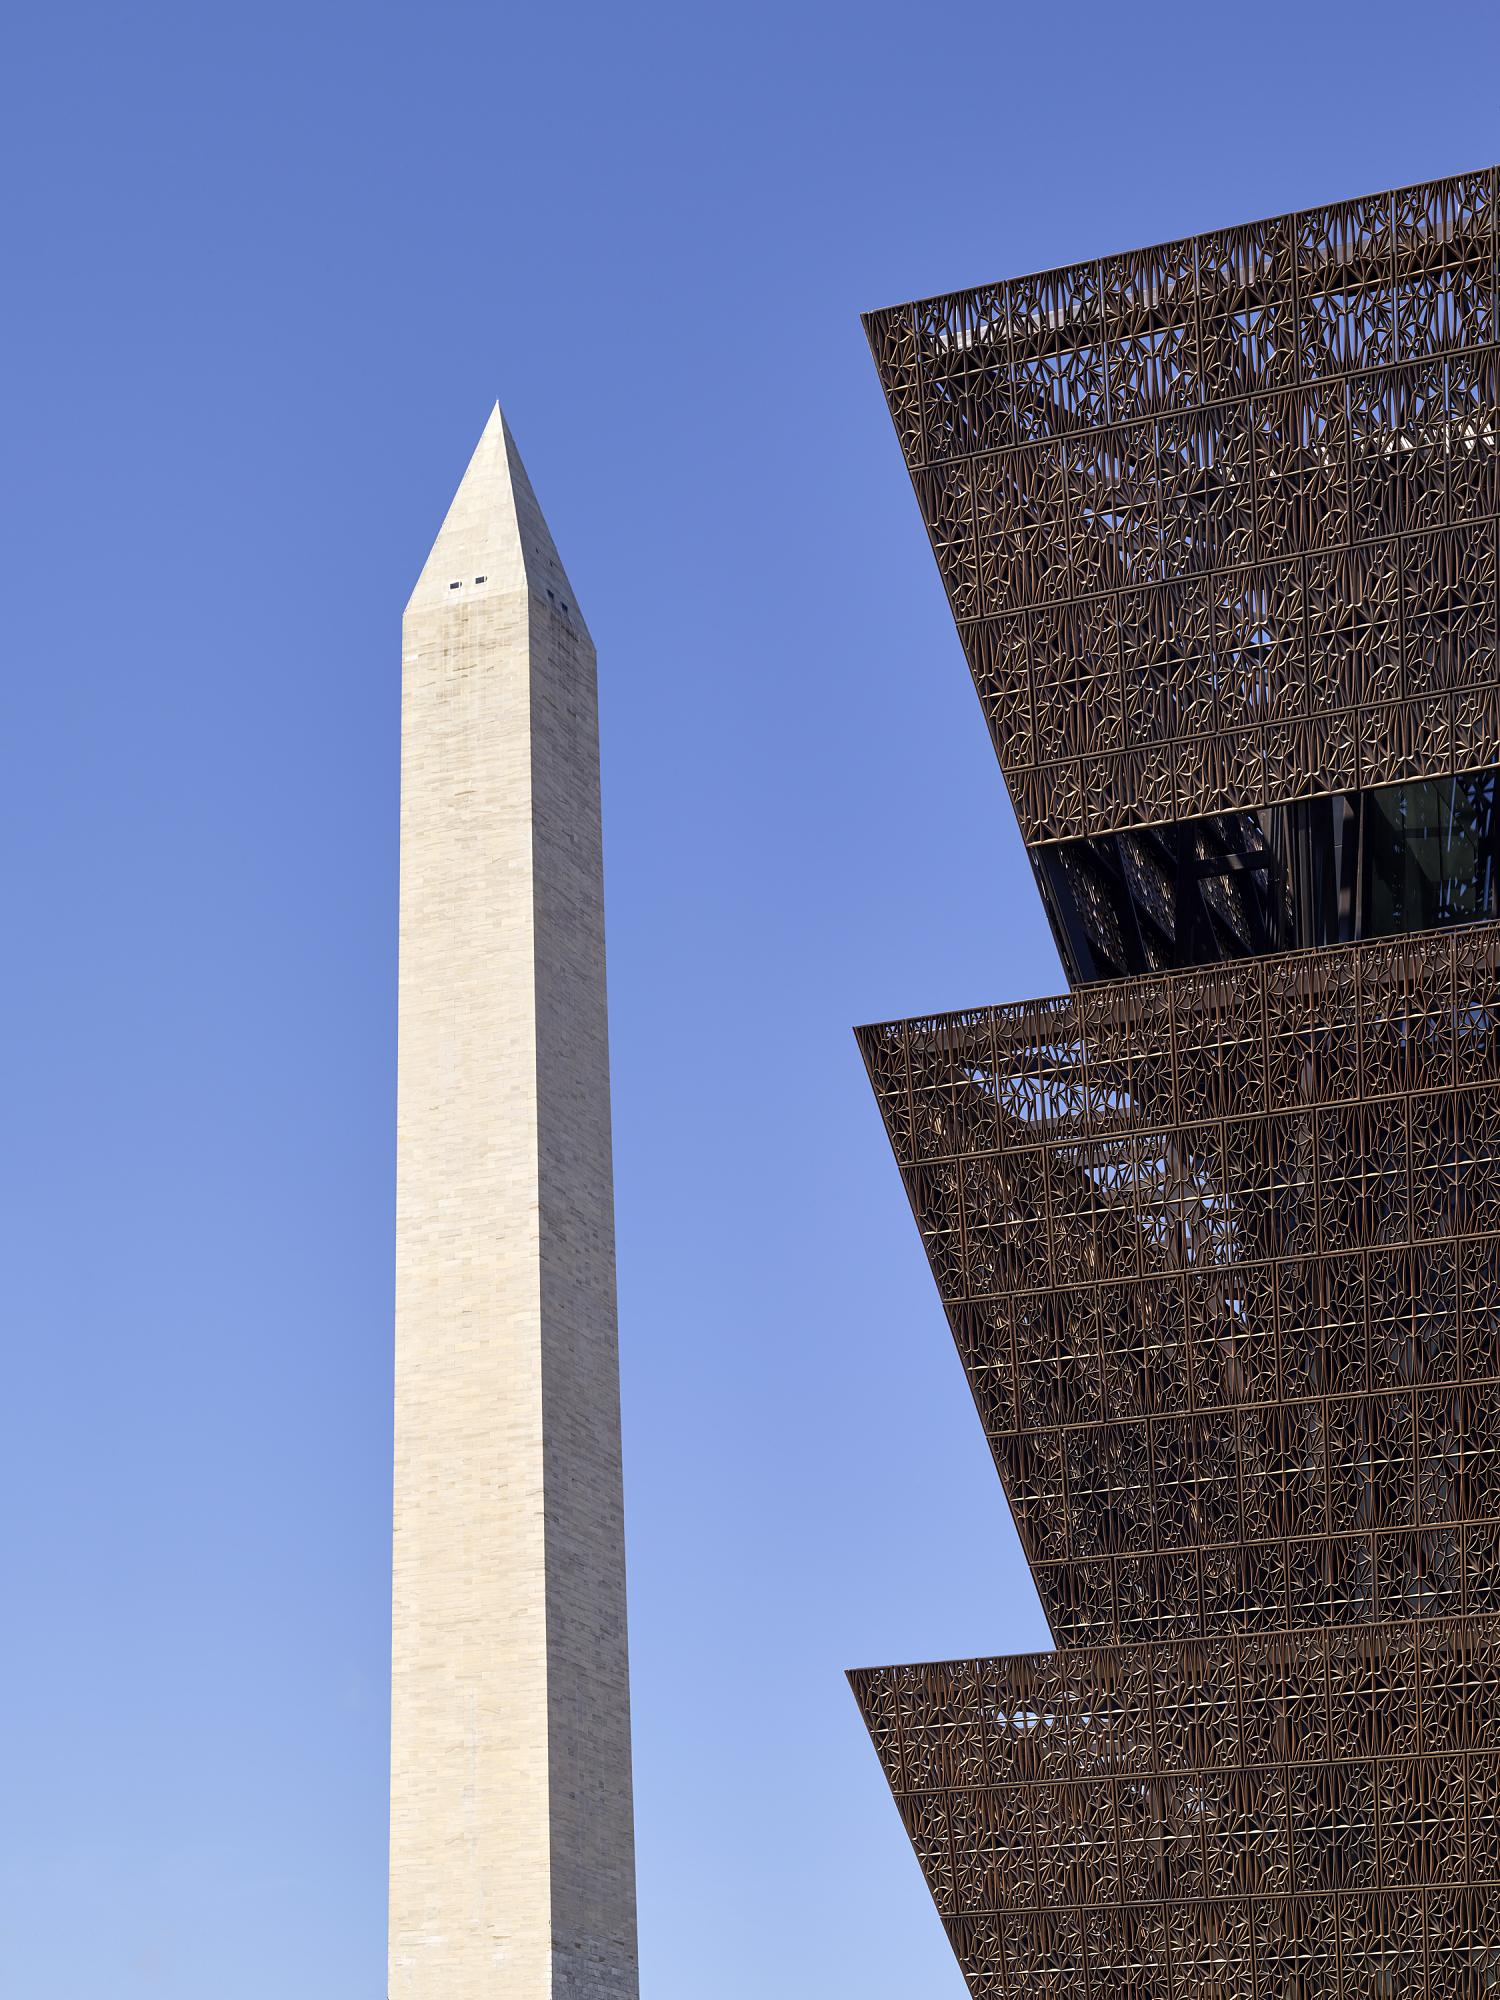 Washington Monument and NMAAHC